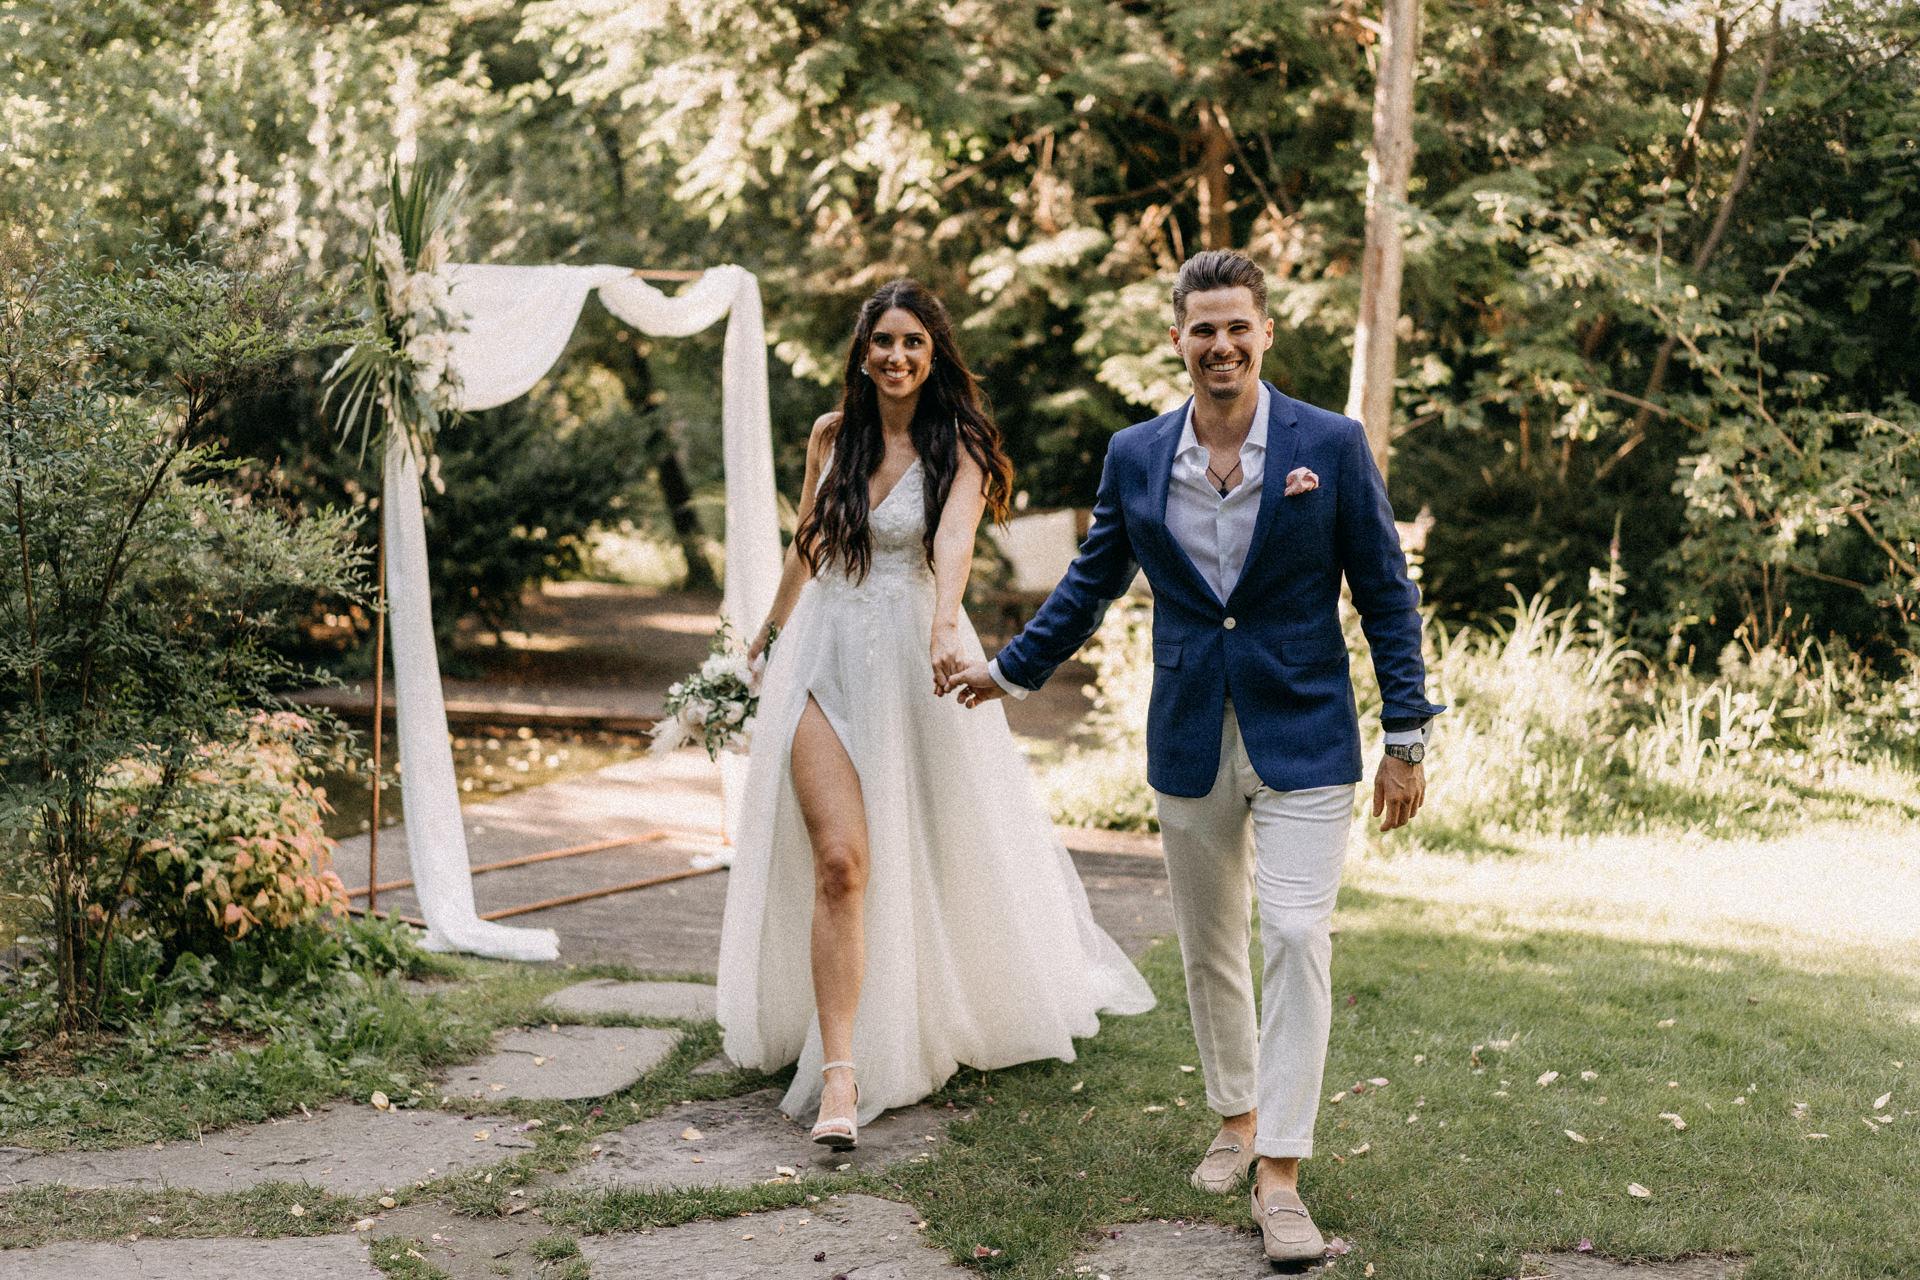 elte fuveszkert eskuvo volegeny menyasszony